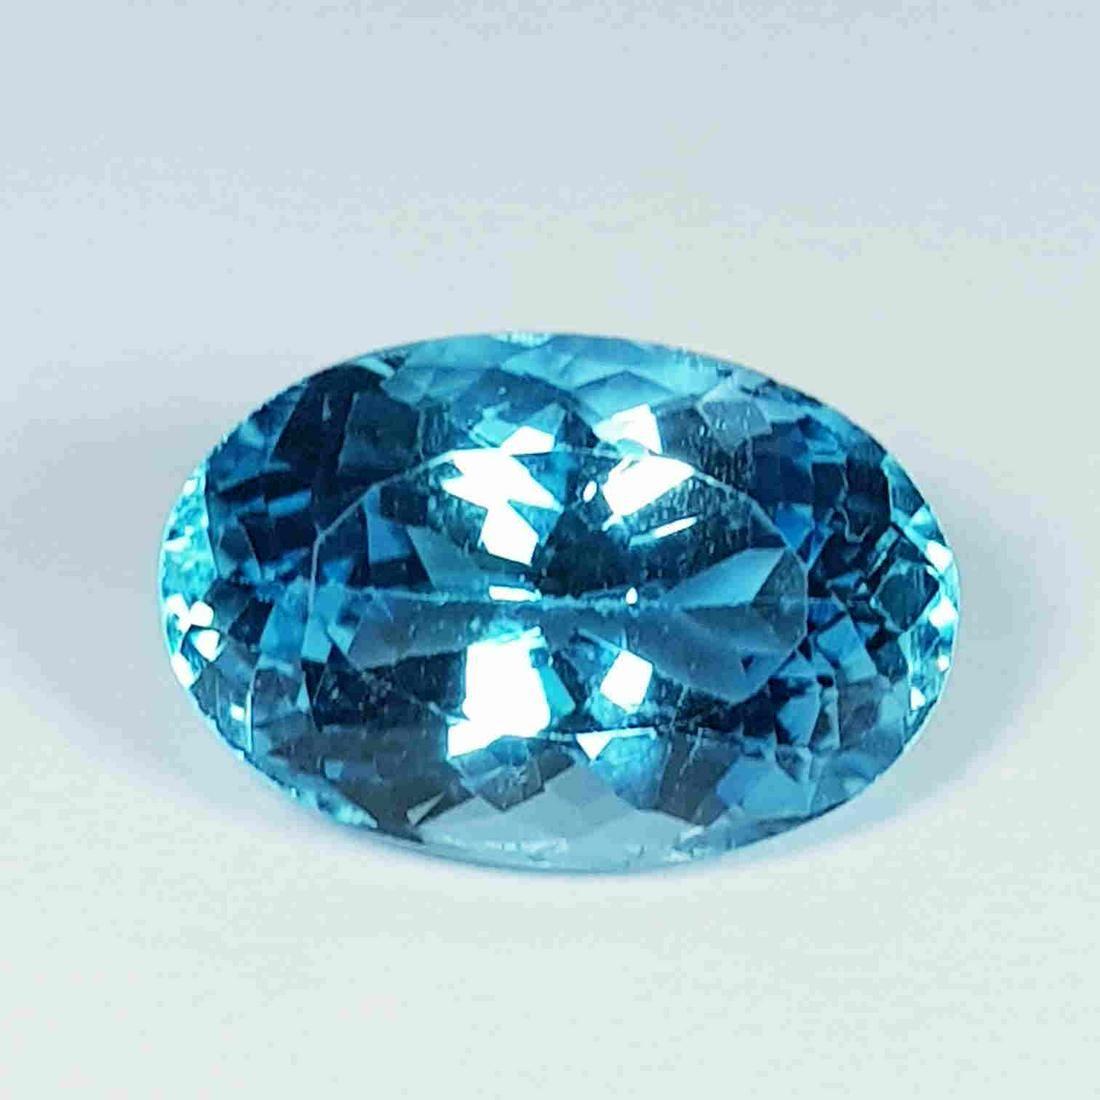 9.75 Ct Top Quality Gem Oval Cut Natural Blue Topaz